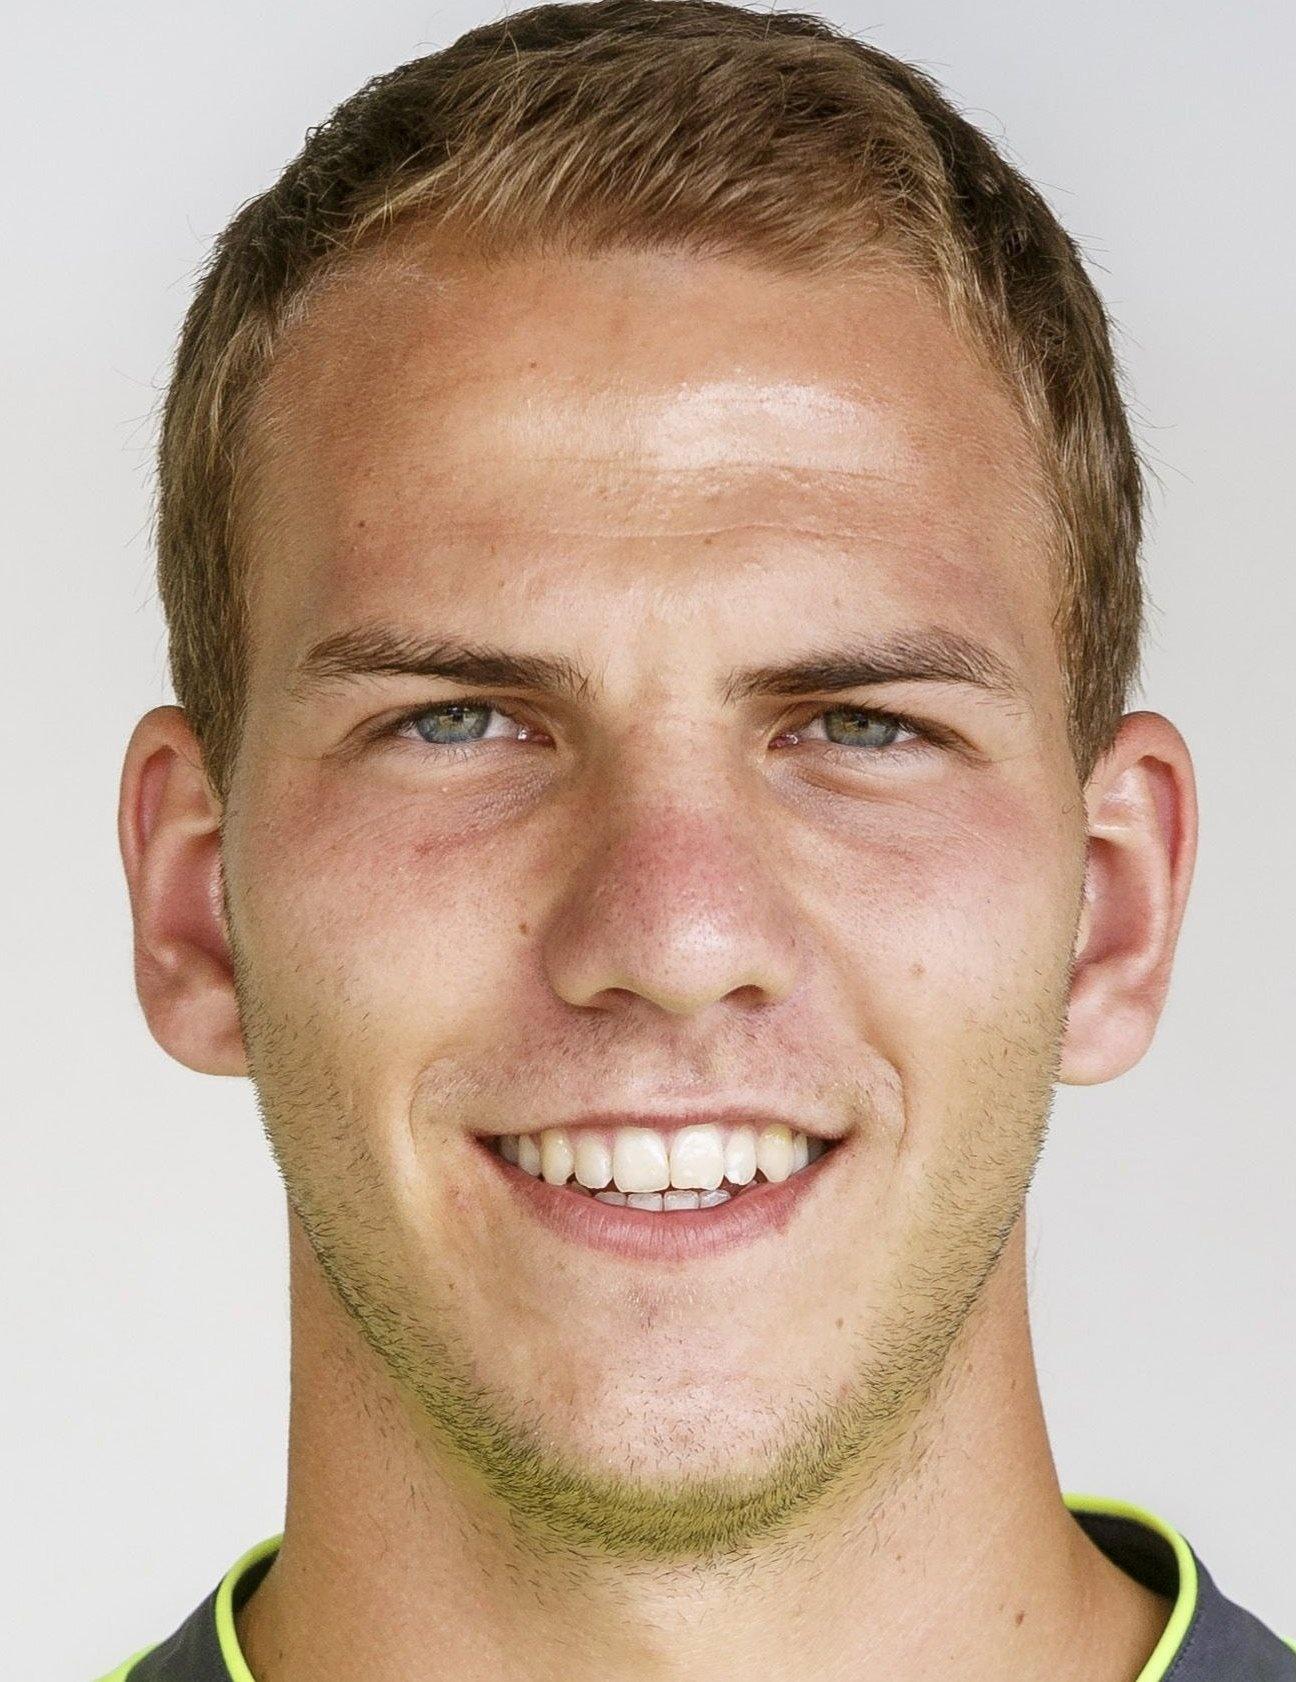 Markus Kuster Perfil Del Jugador 17 18 Transfermarkt